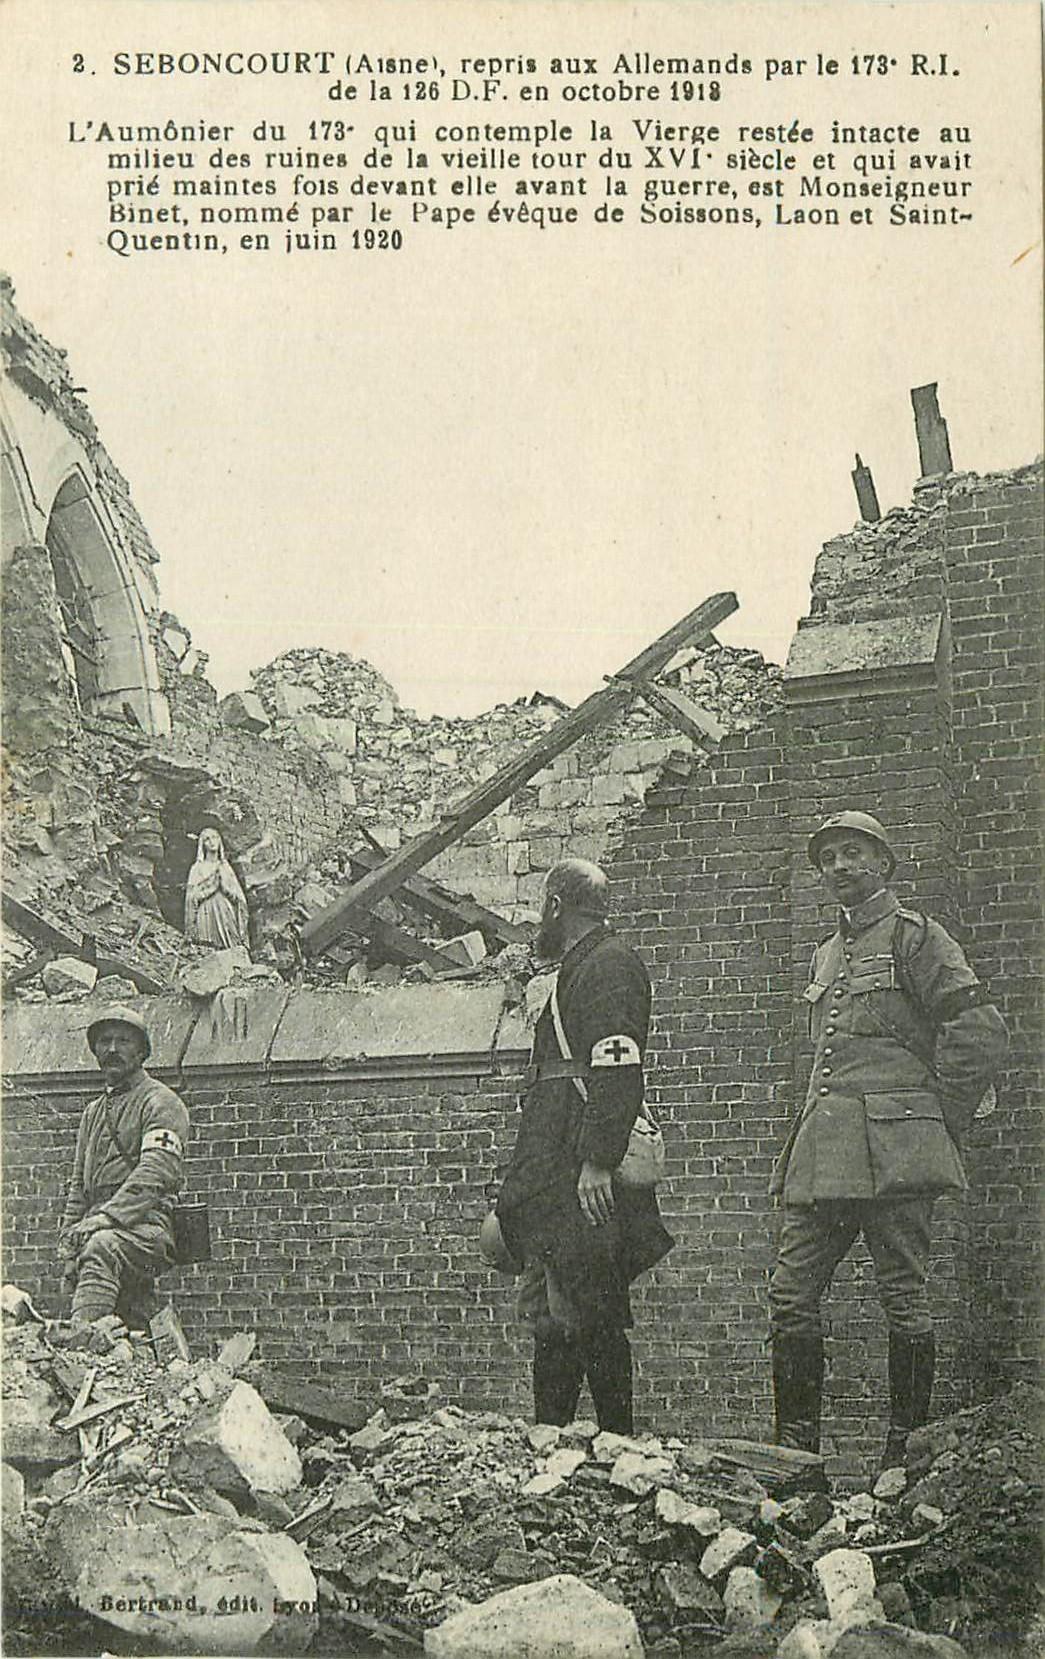 WW 02 SEBONCOURT. Aumônier et Vierge intacte 1918